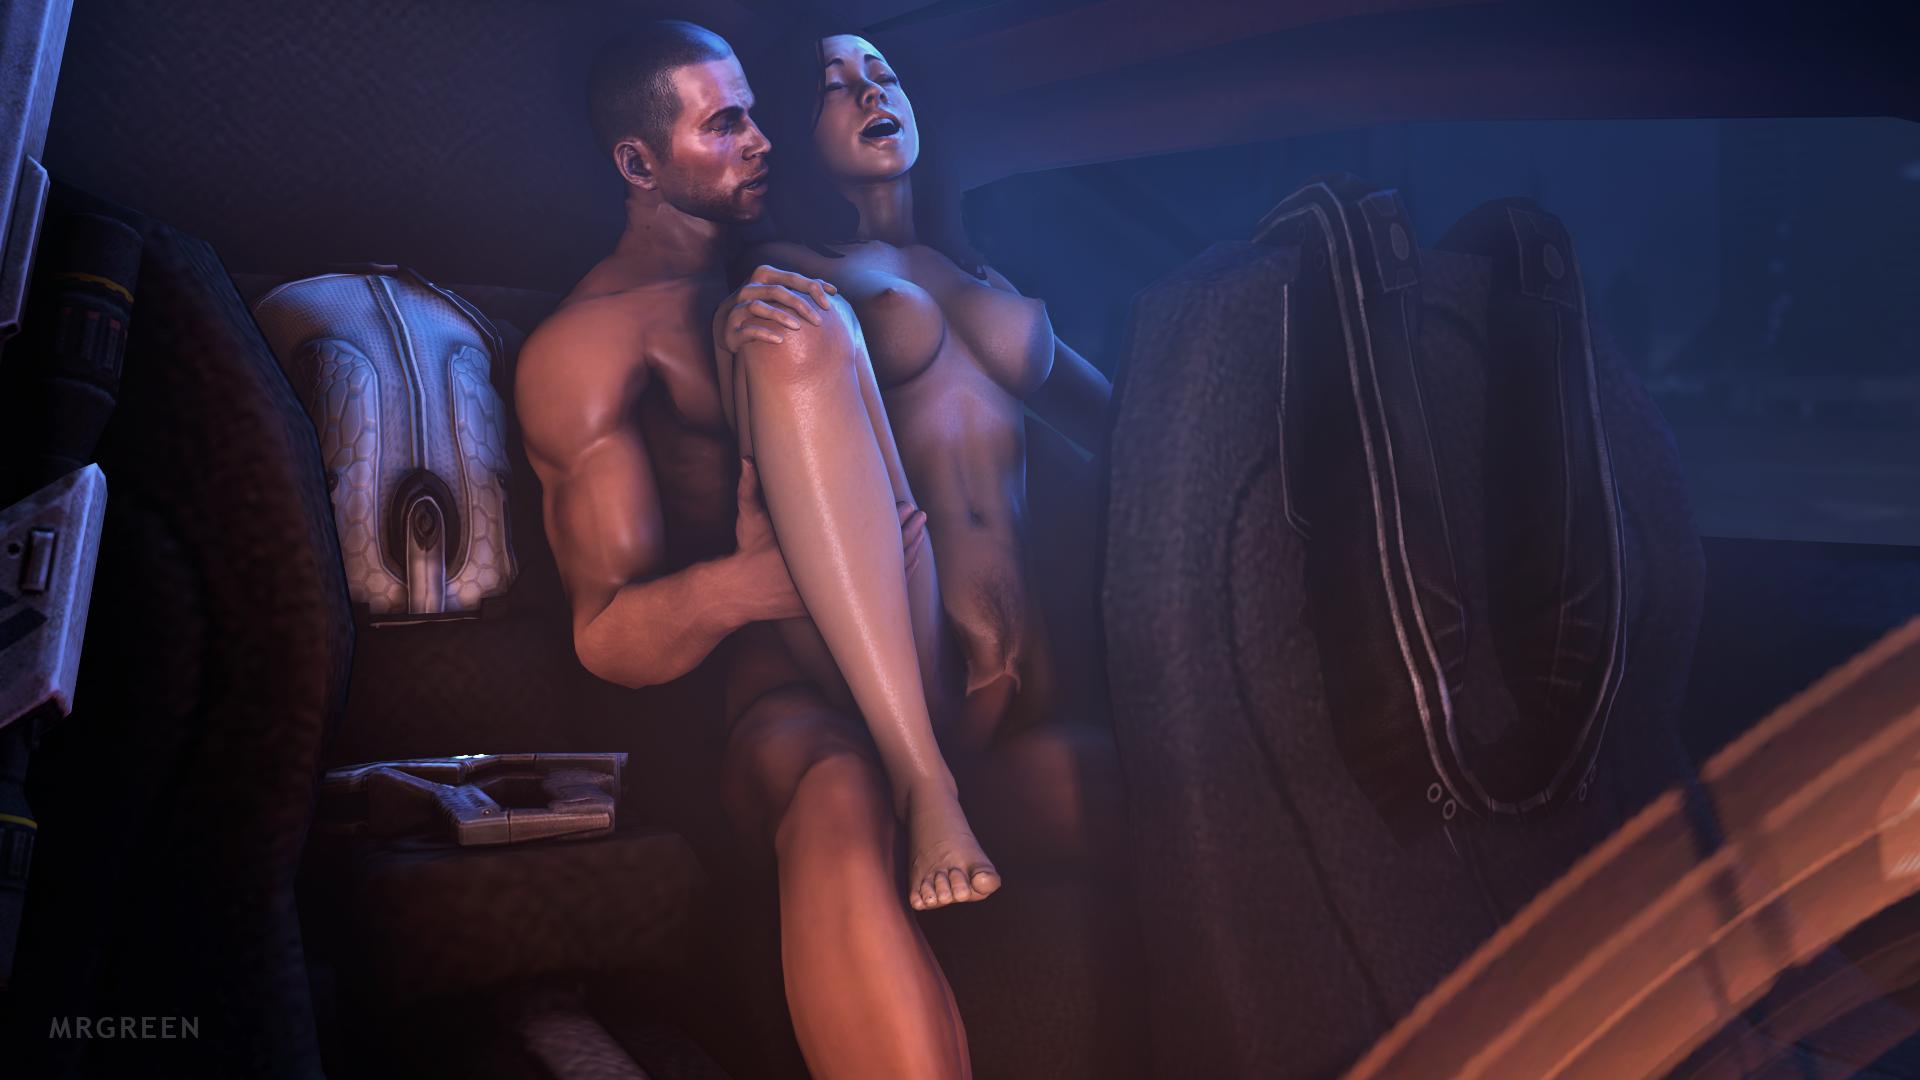 Секс в видеоиграх видео, порно крупно фото домашнее